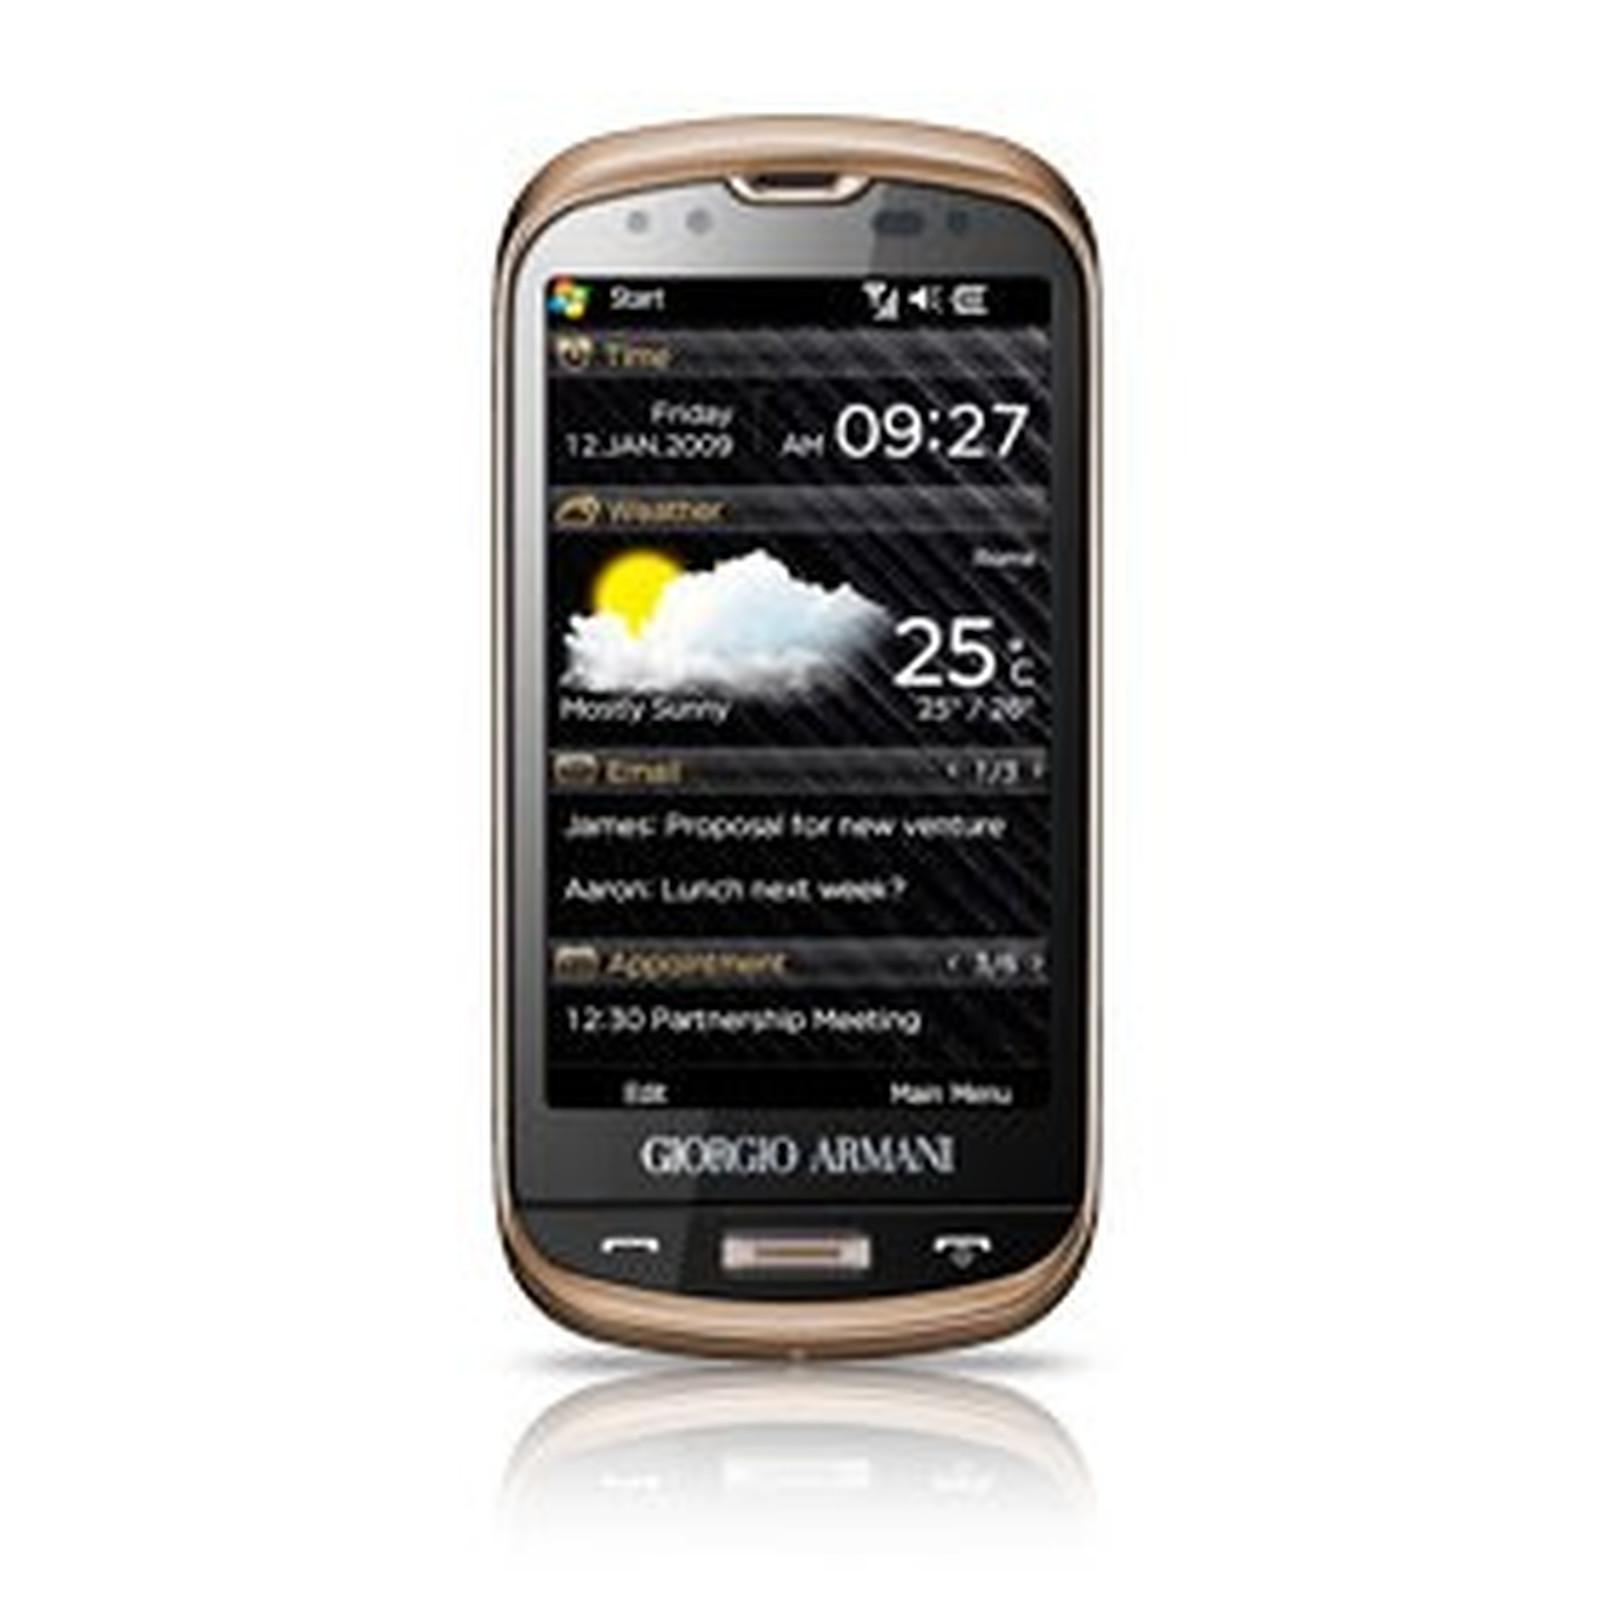 Samsung B7620 Giorgio Armani Qwerty